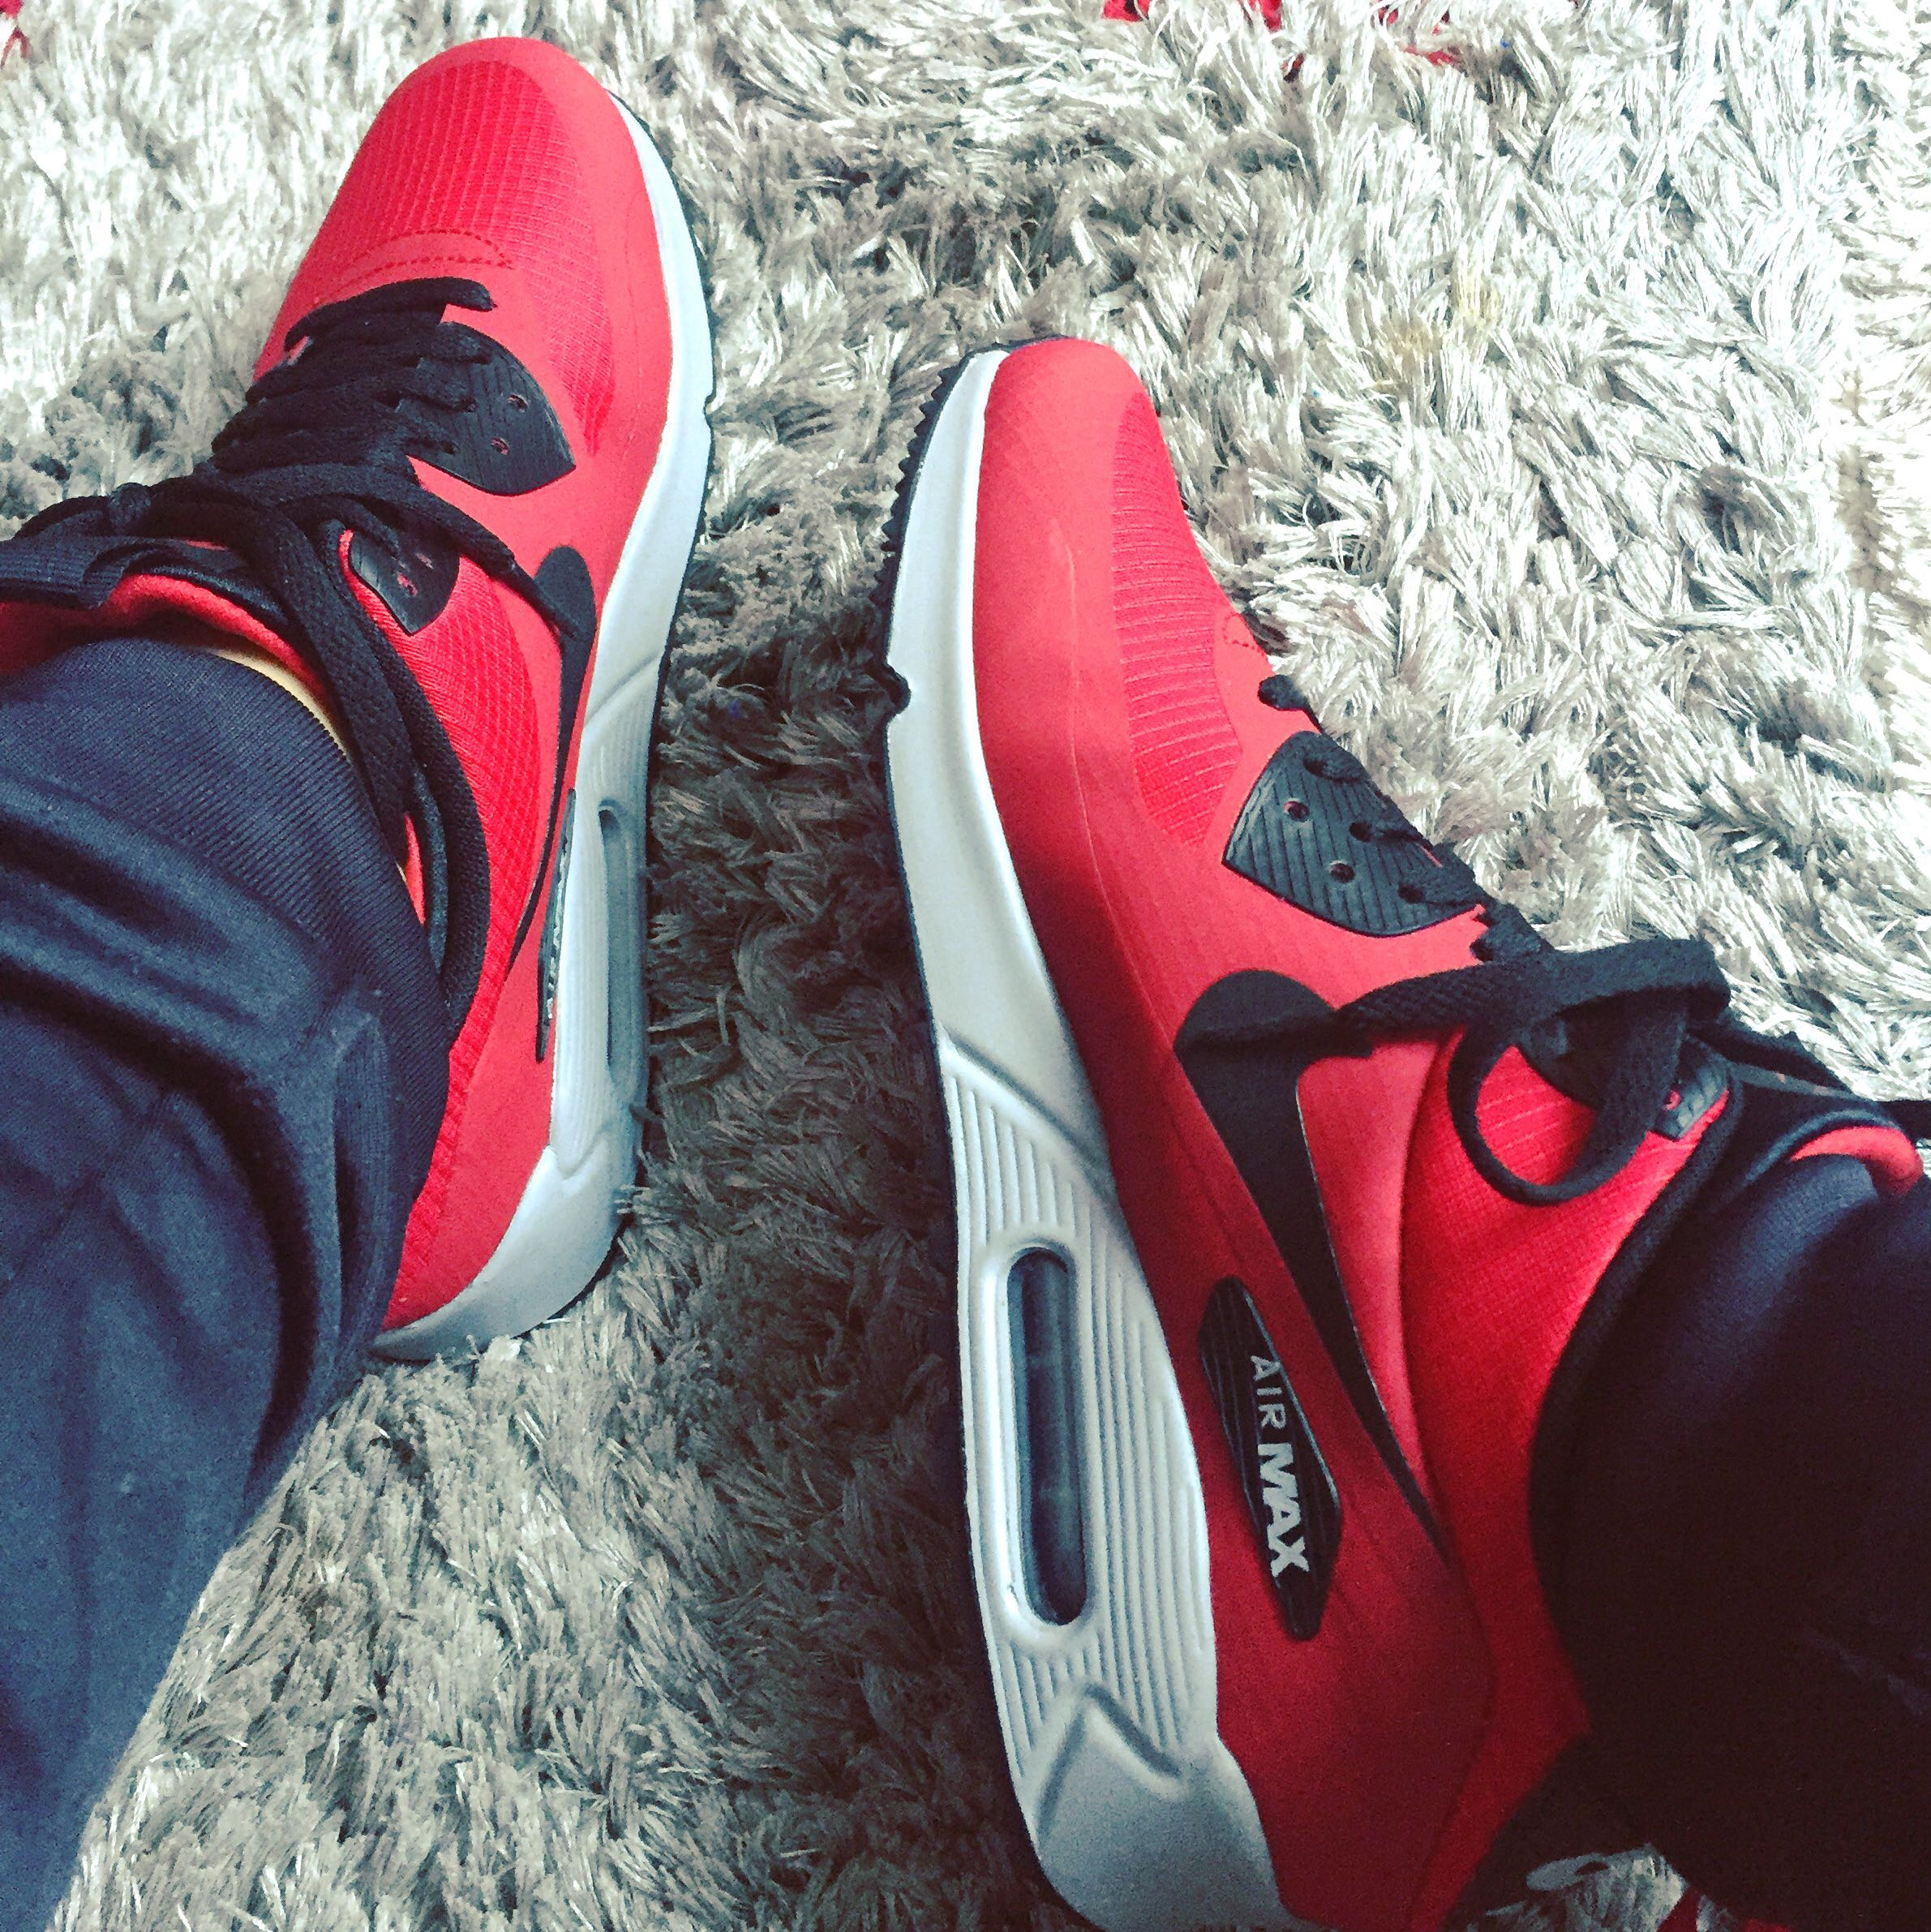 sneakers for cheap 84db8 149c6 (Frauen, Männer, Nike)